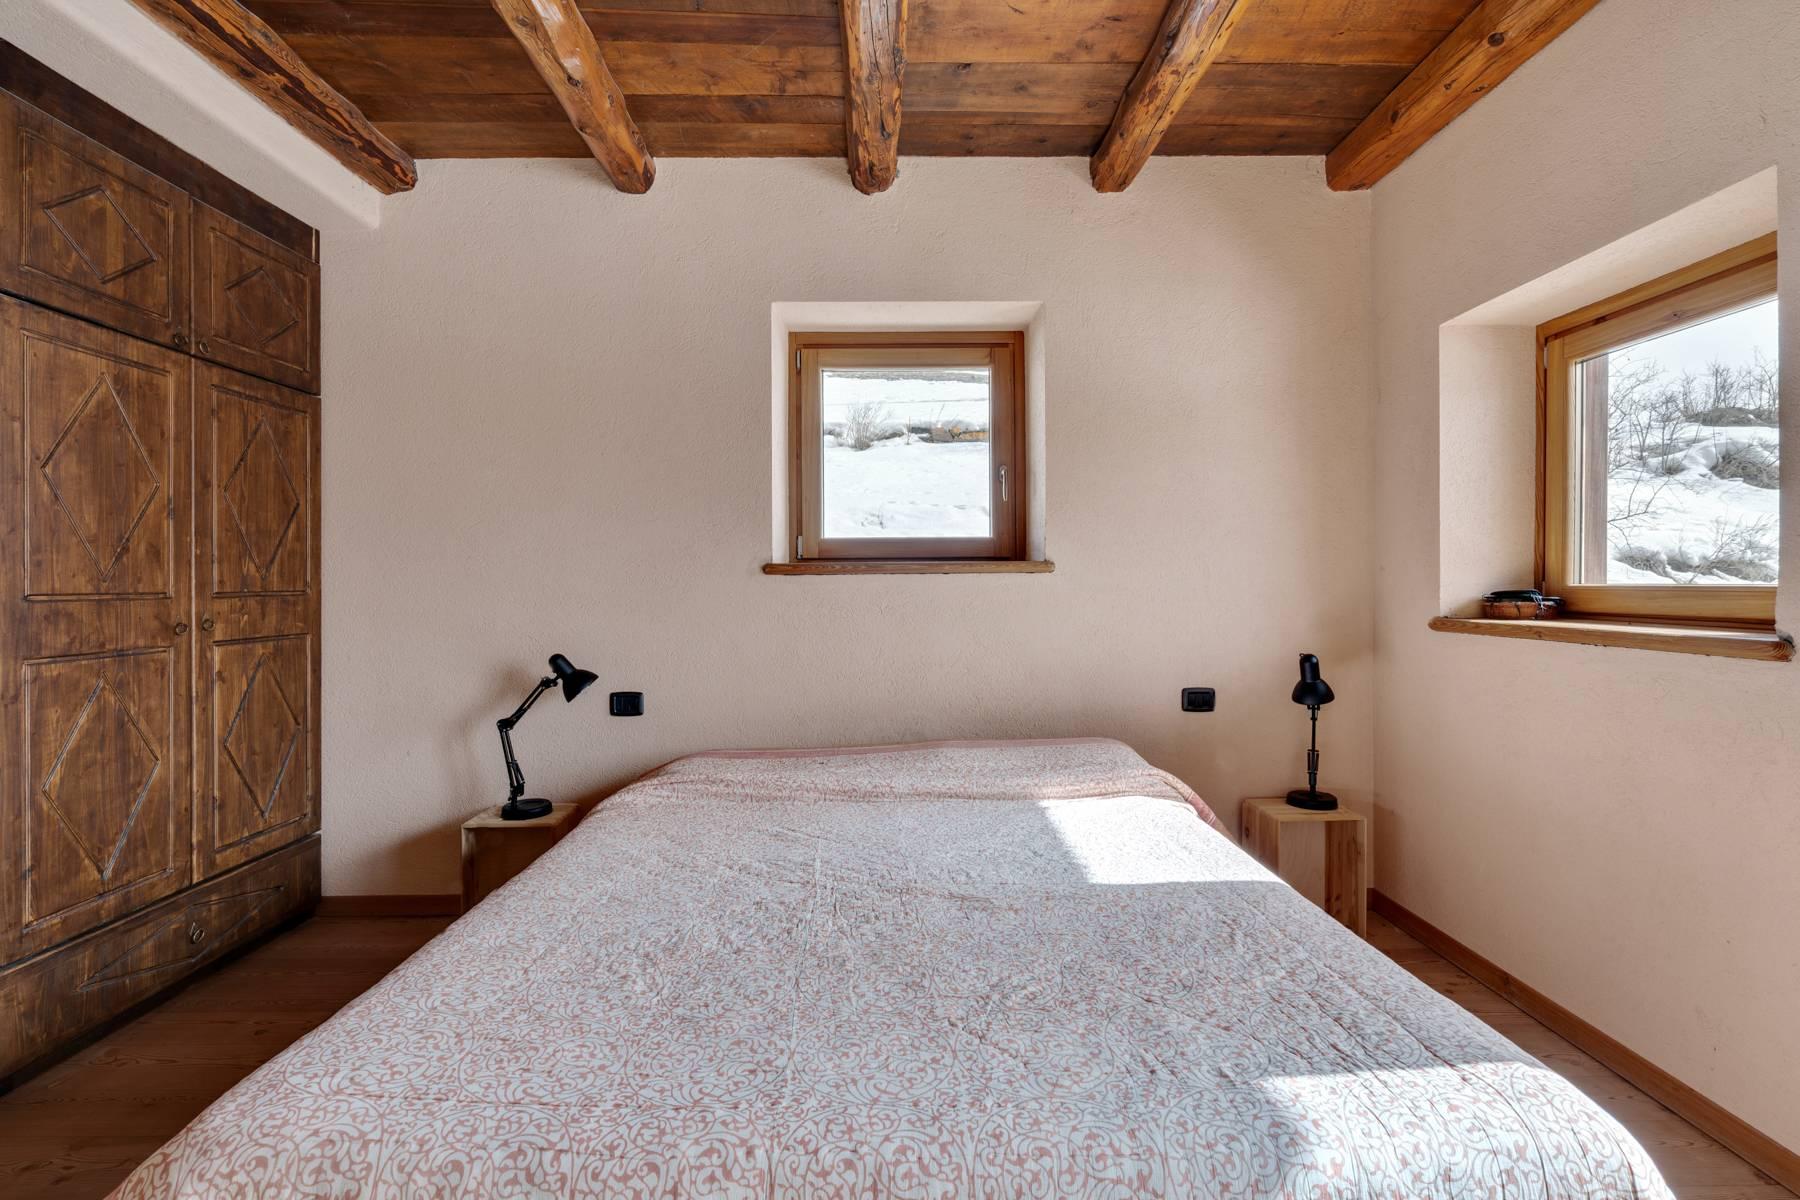 Villa in Vendita a Cogne: 5 locali, 384 mq - Foto 21